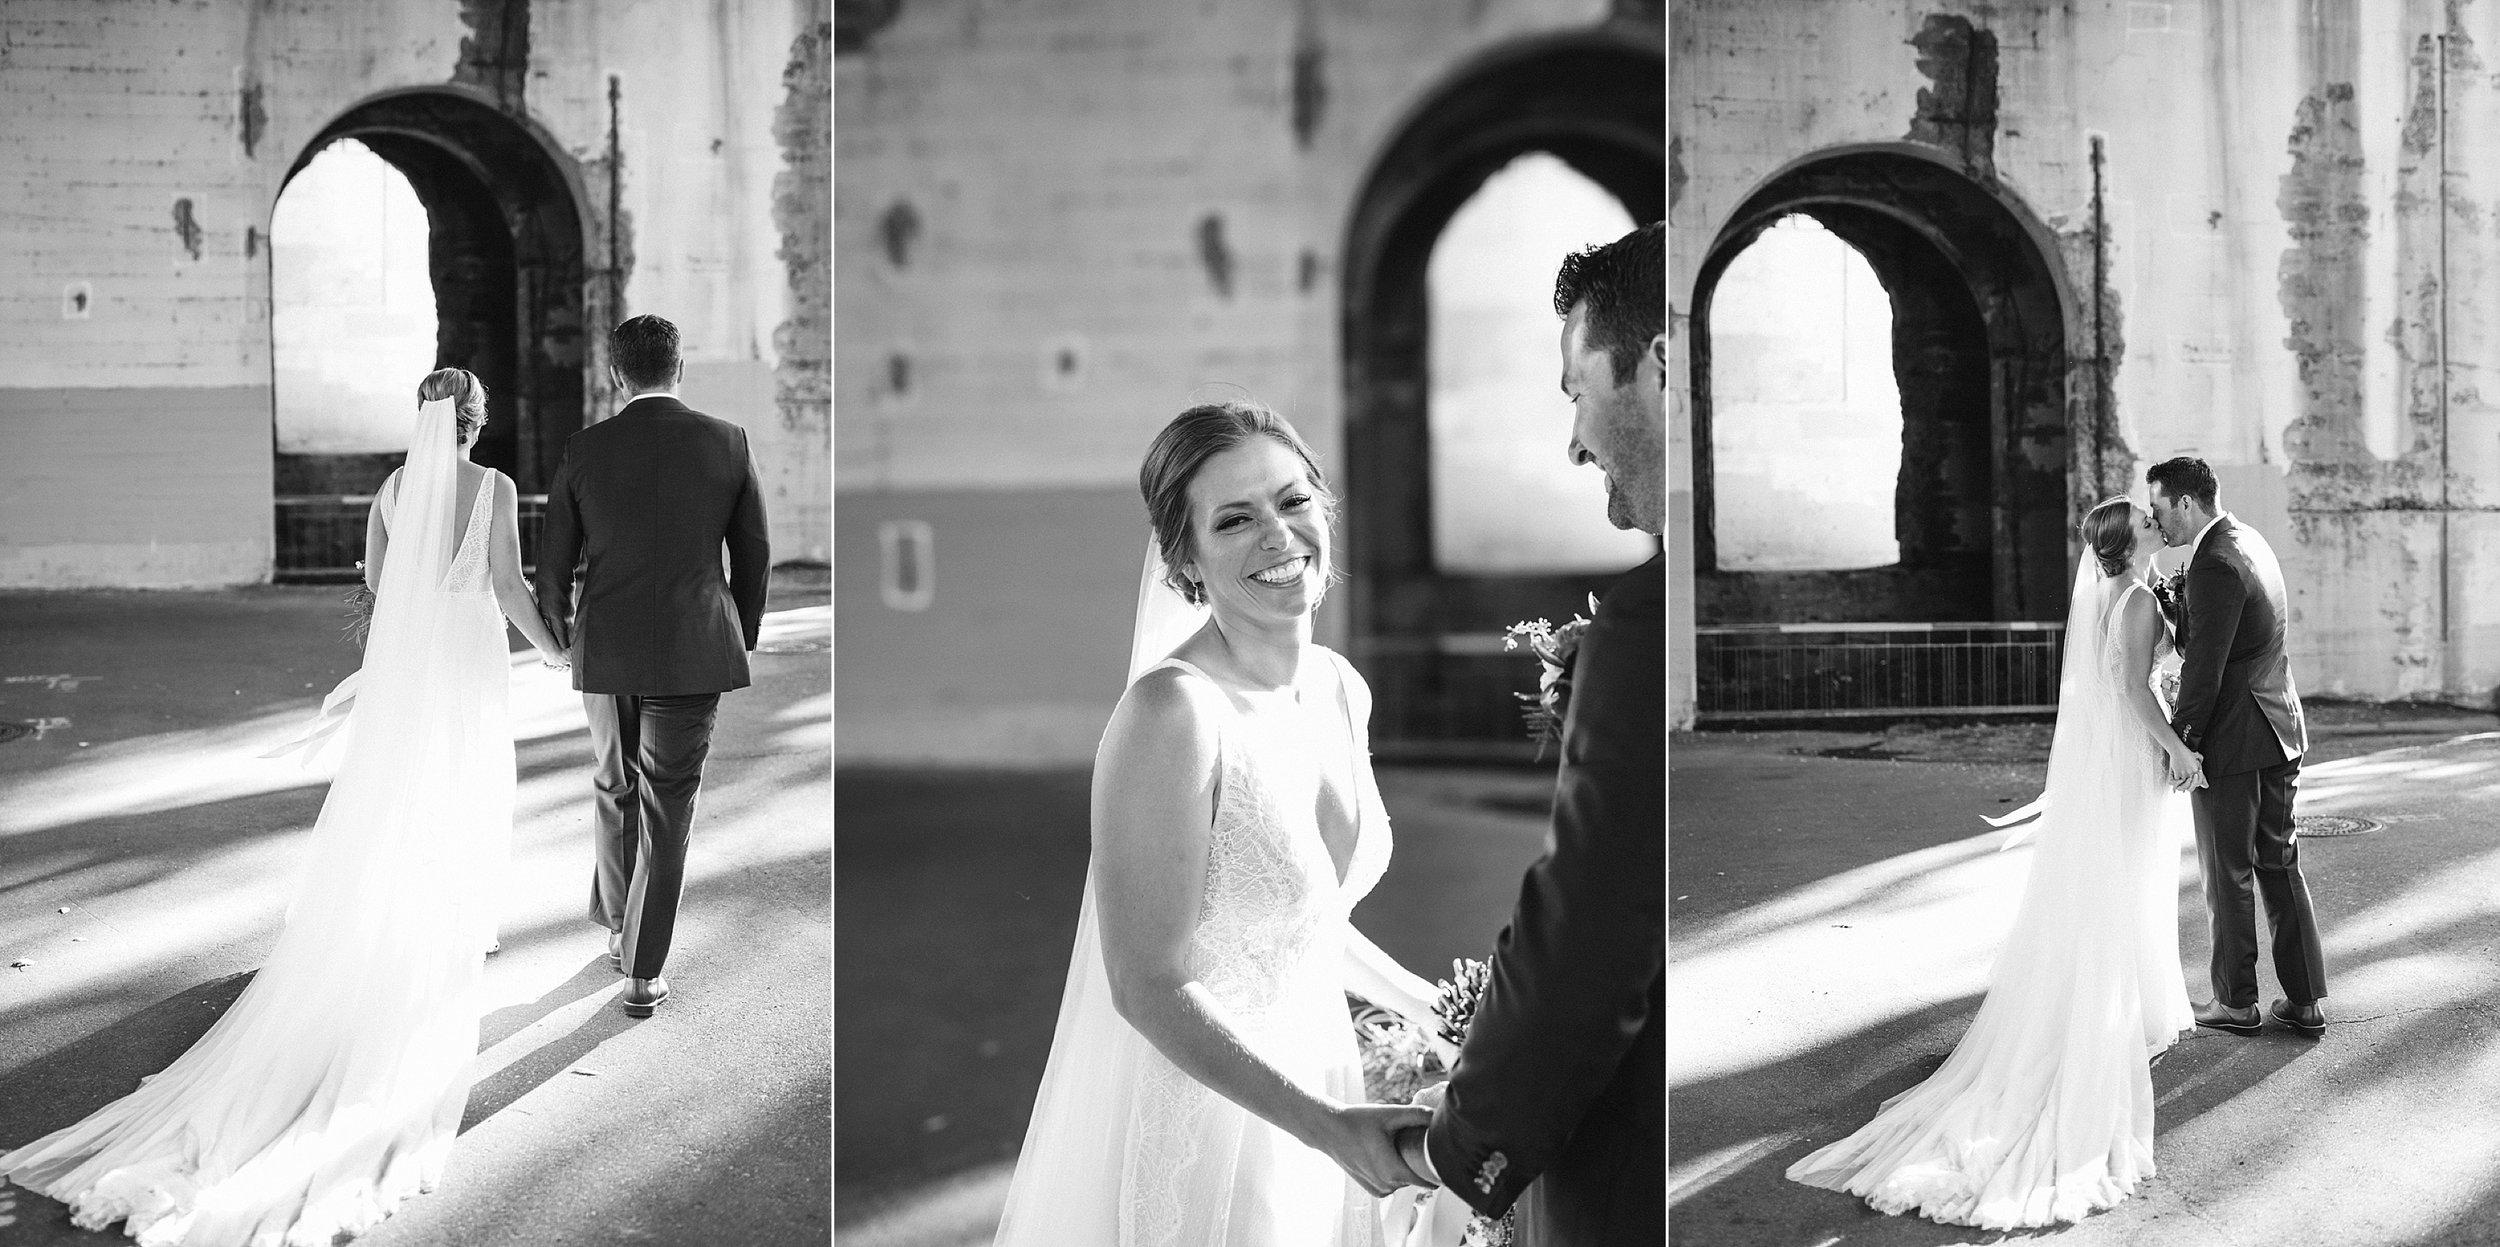 Nicollet-Island-Pavilion-Minneapolis-September-Coral-Navy-Wedding-65.jpg